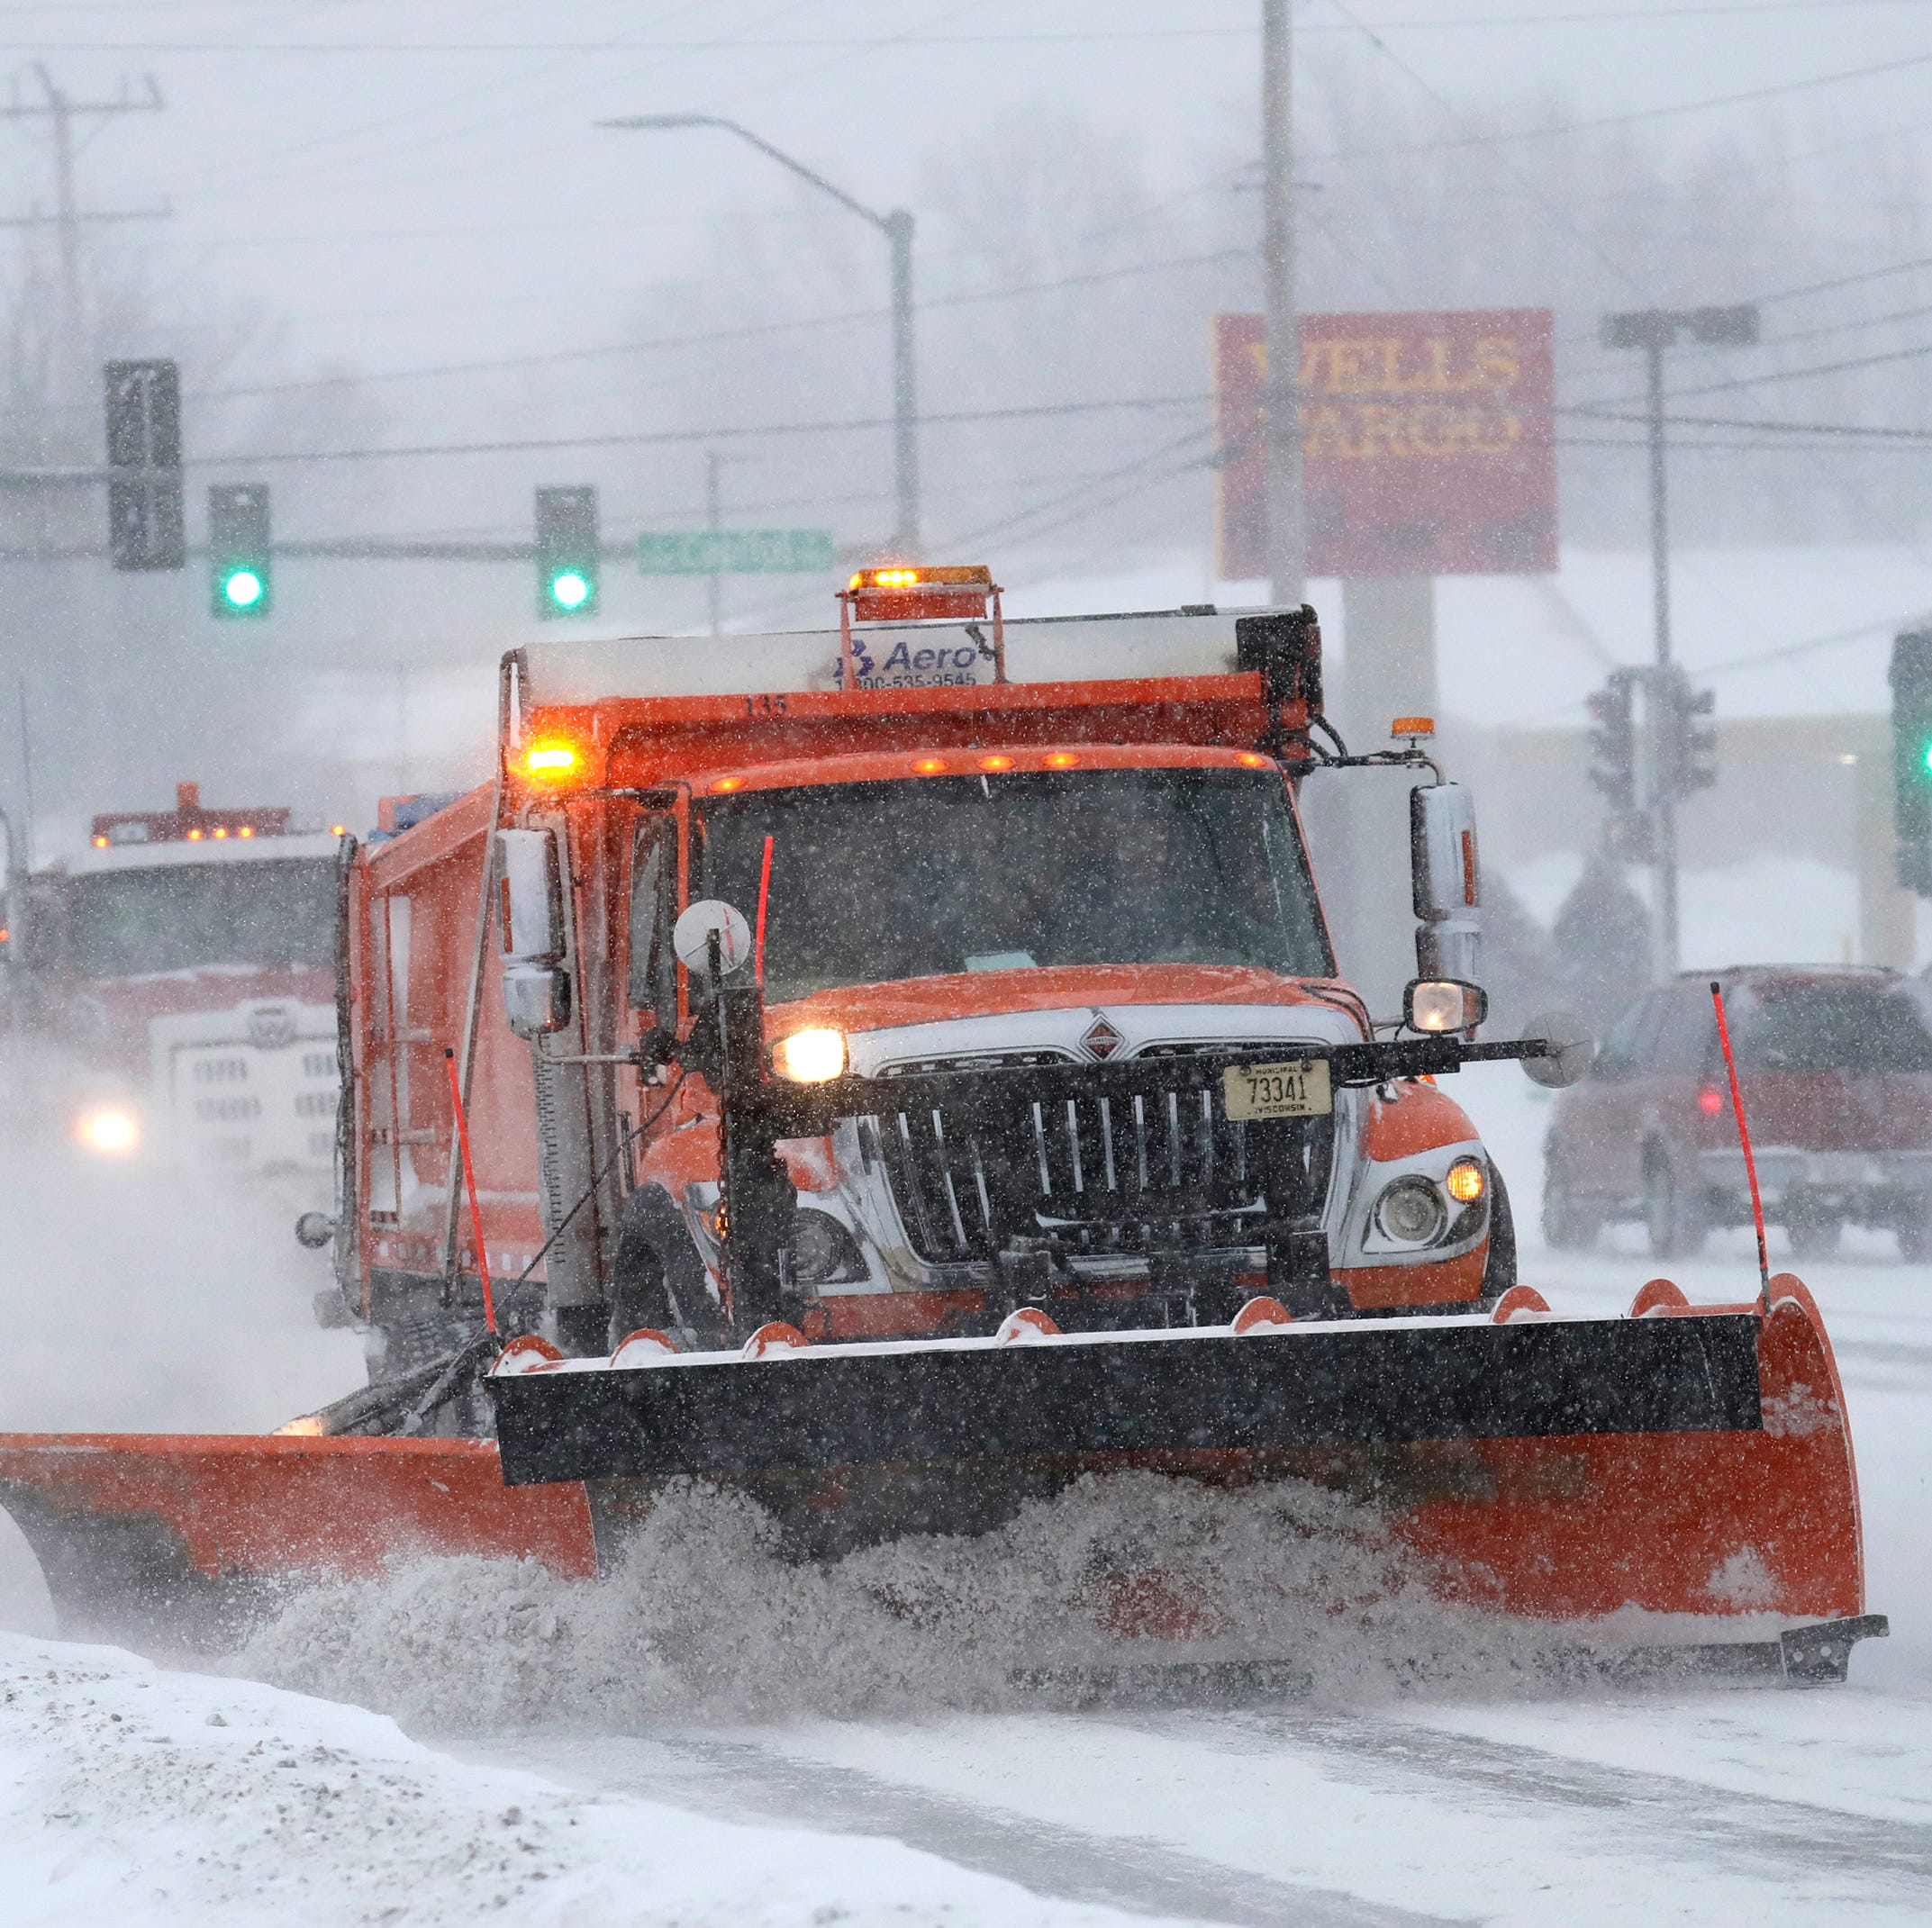 City of Oshkosh garbage collection still on, despite snow; town of Algoma canceled